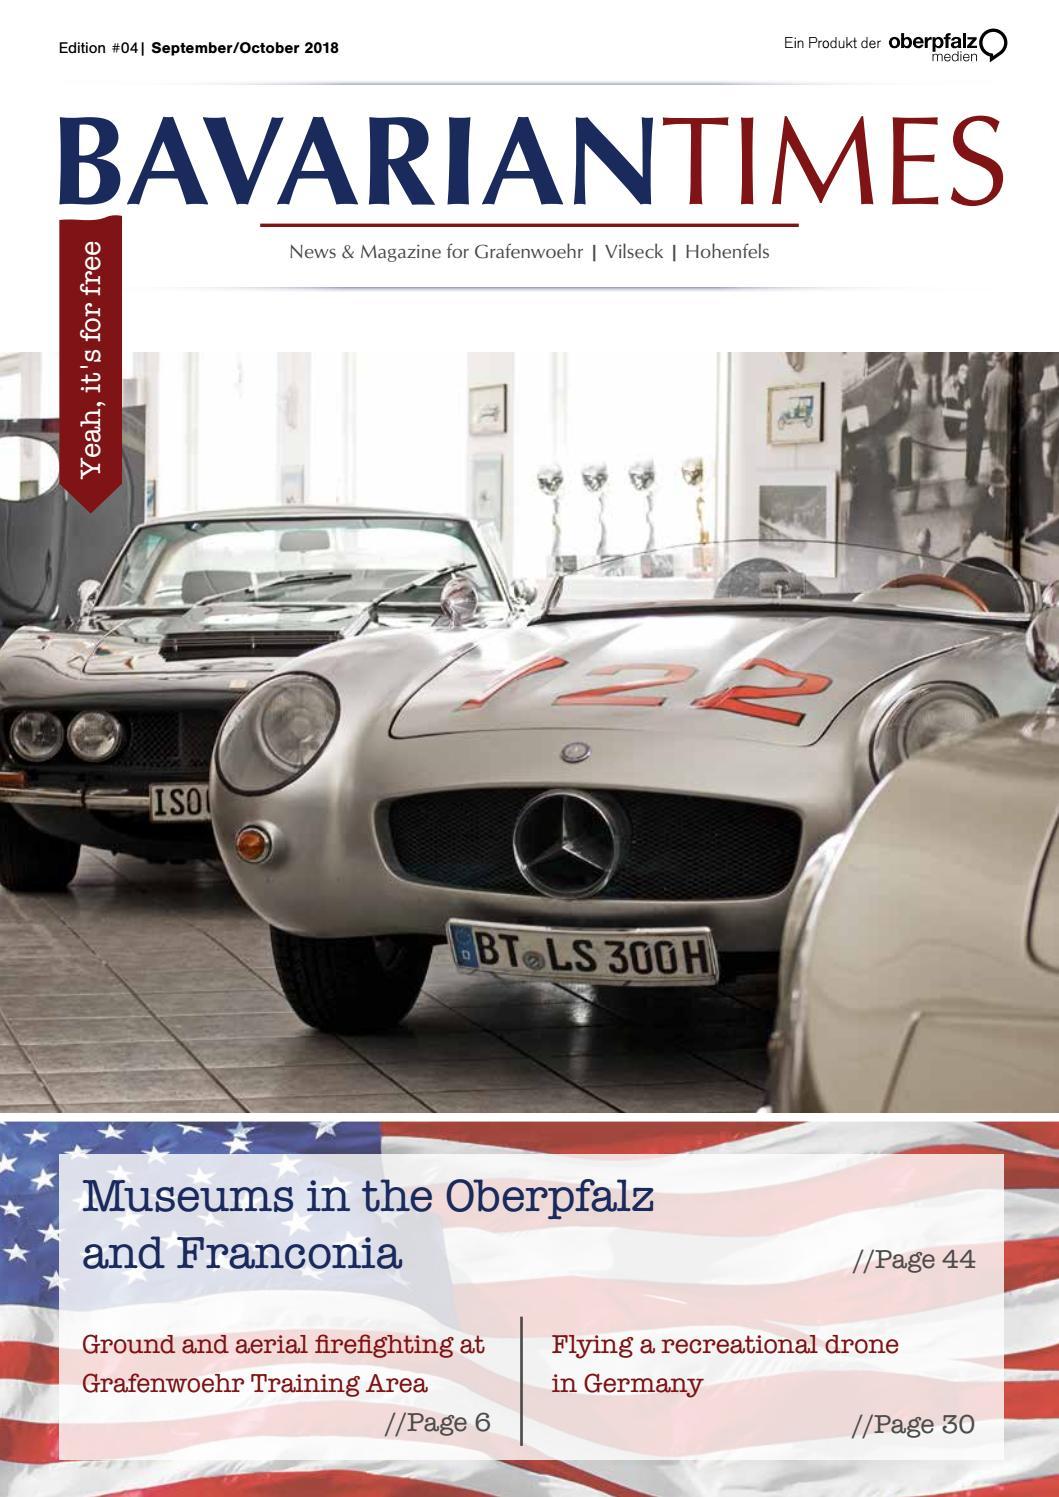 Bavarian Times Magazine - Edition 04 - September/October